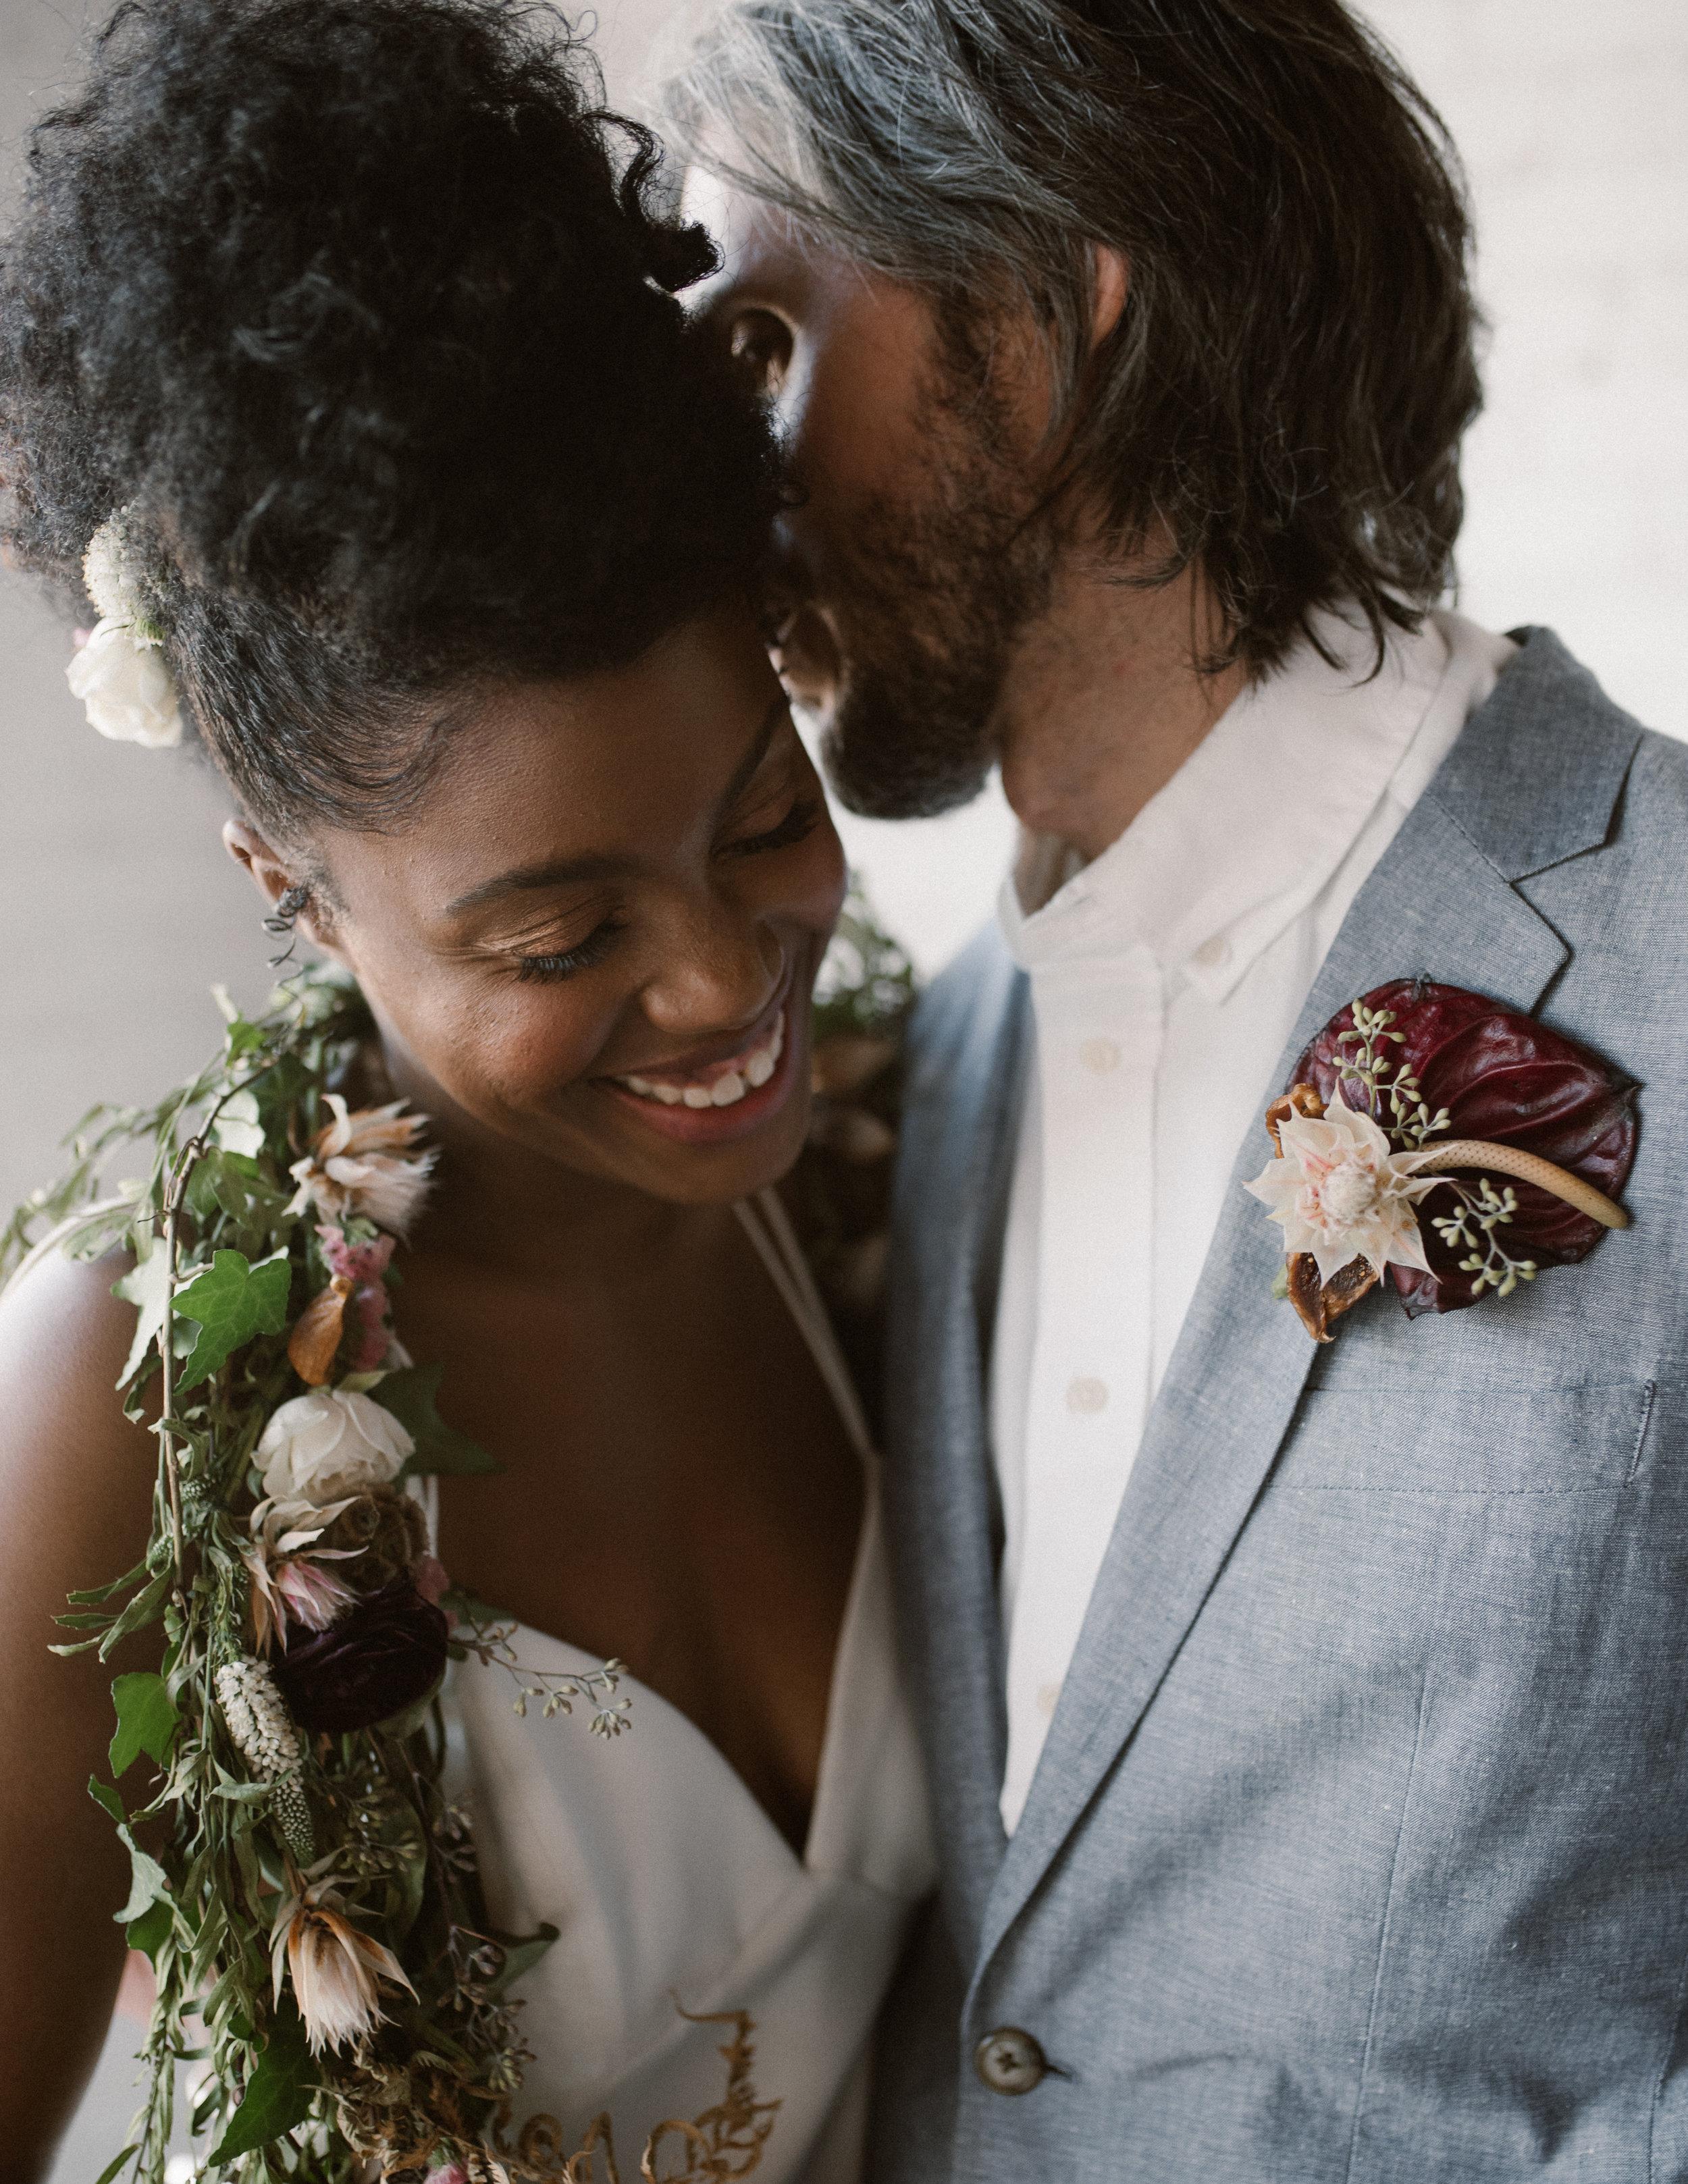 haus-820-minimal-editorial-wedding-styled-shoot-51.jpg